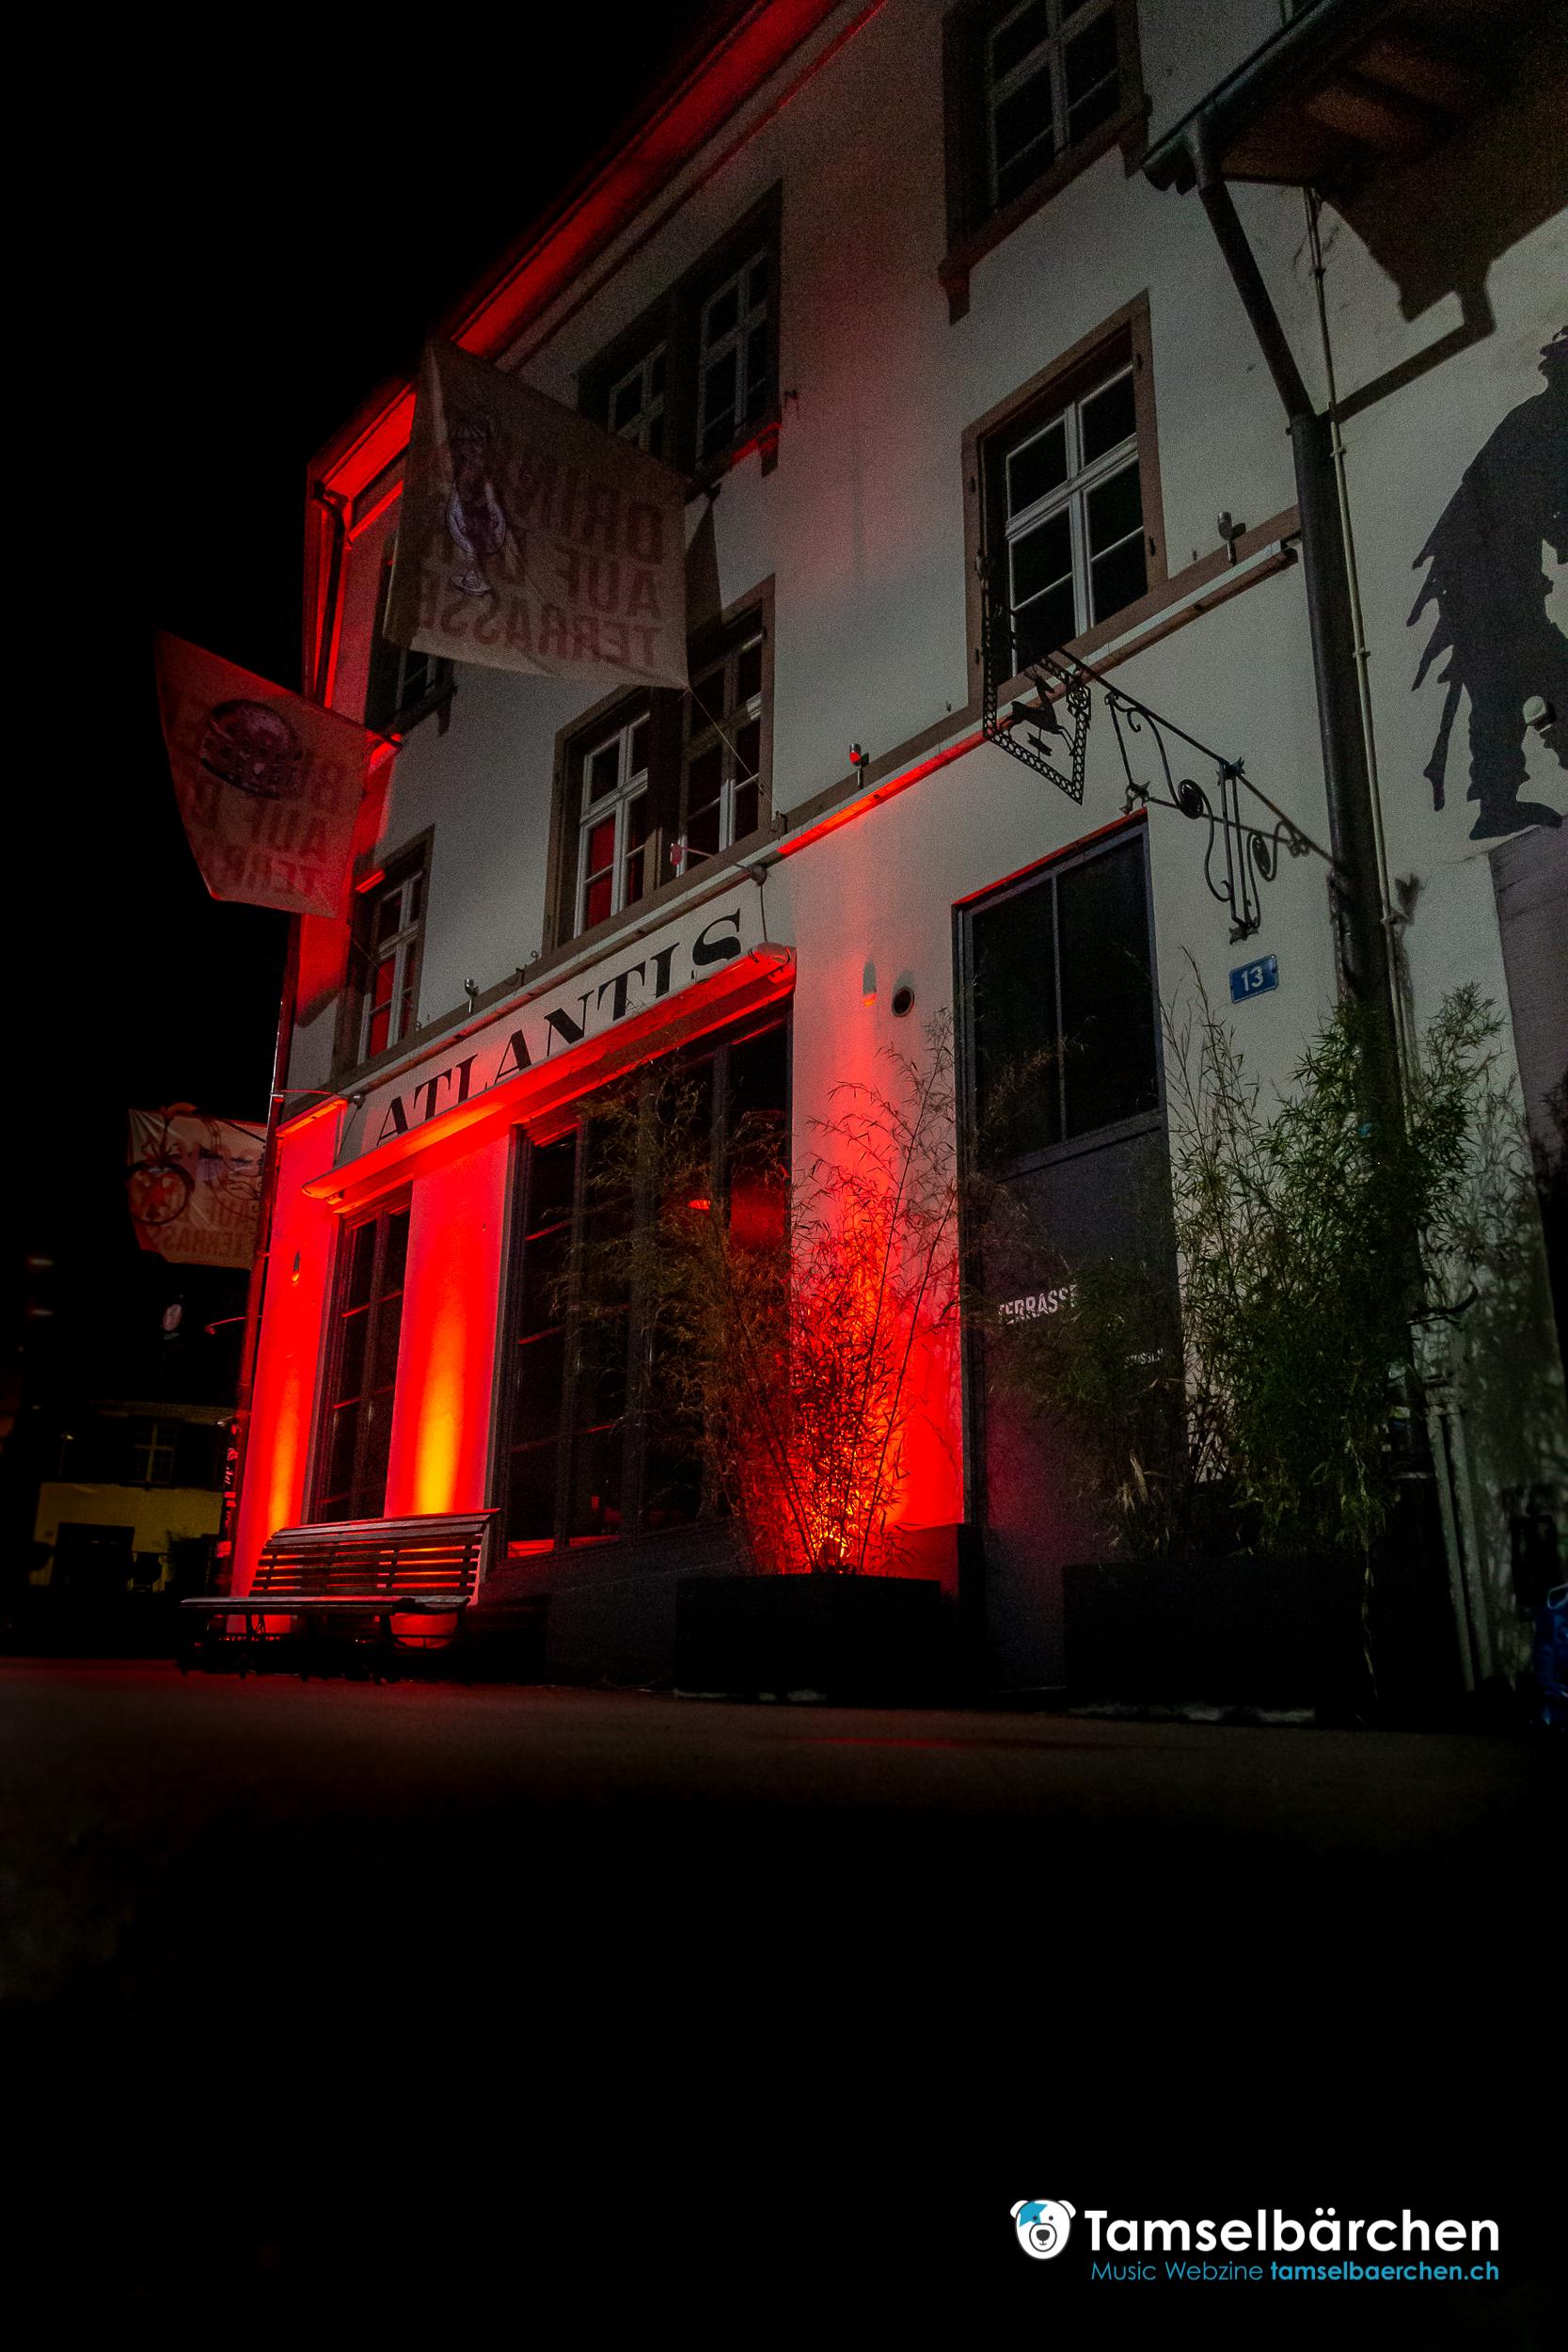 tamselbaerchen-nightoflight-10